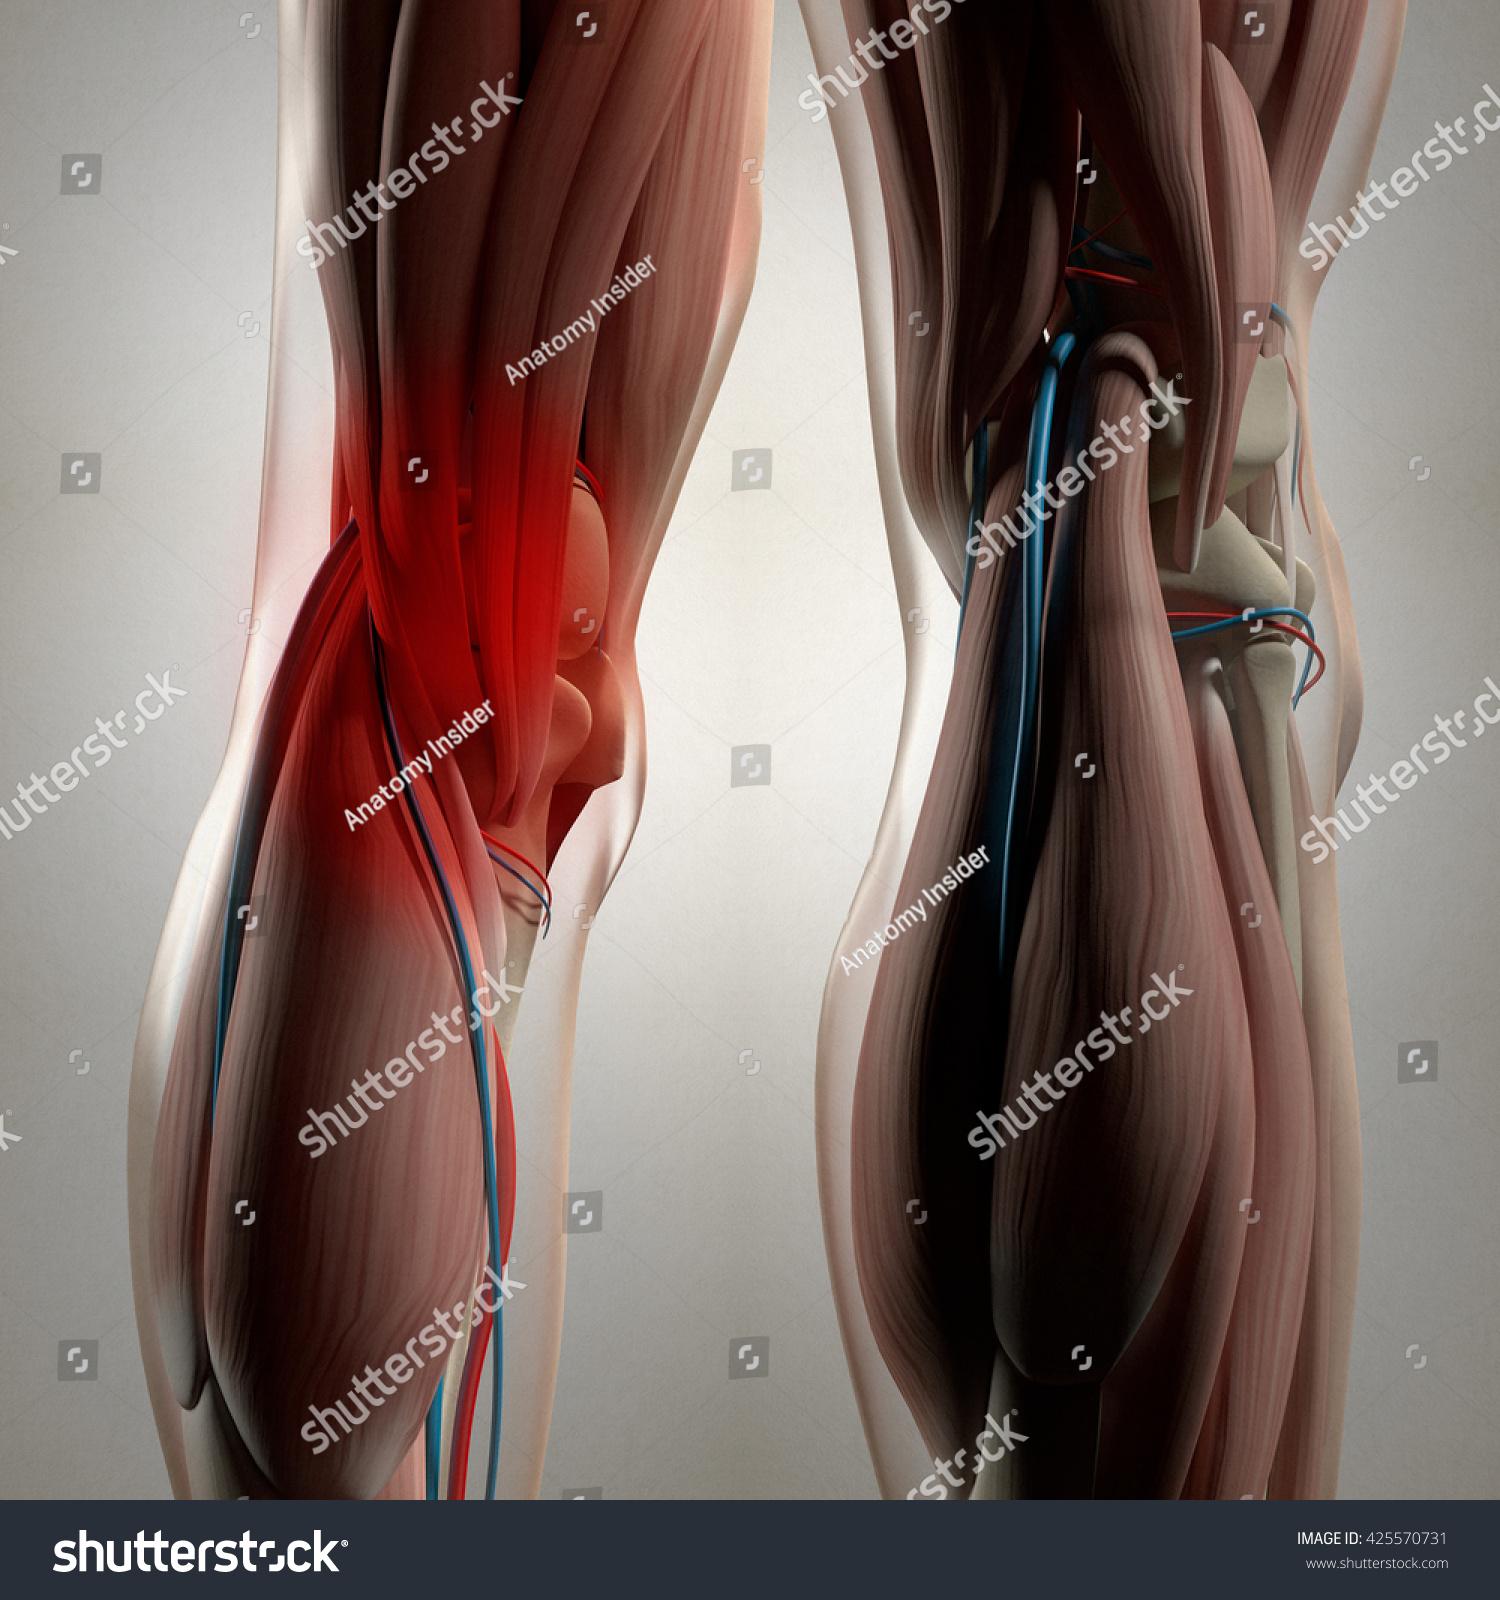 Human Anatomy Back Legs Calf Muscles 425570731